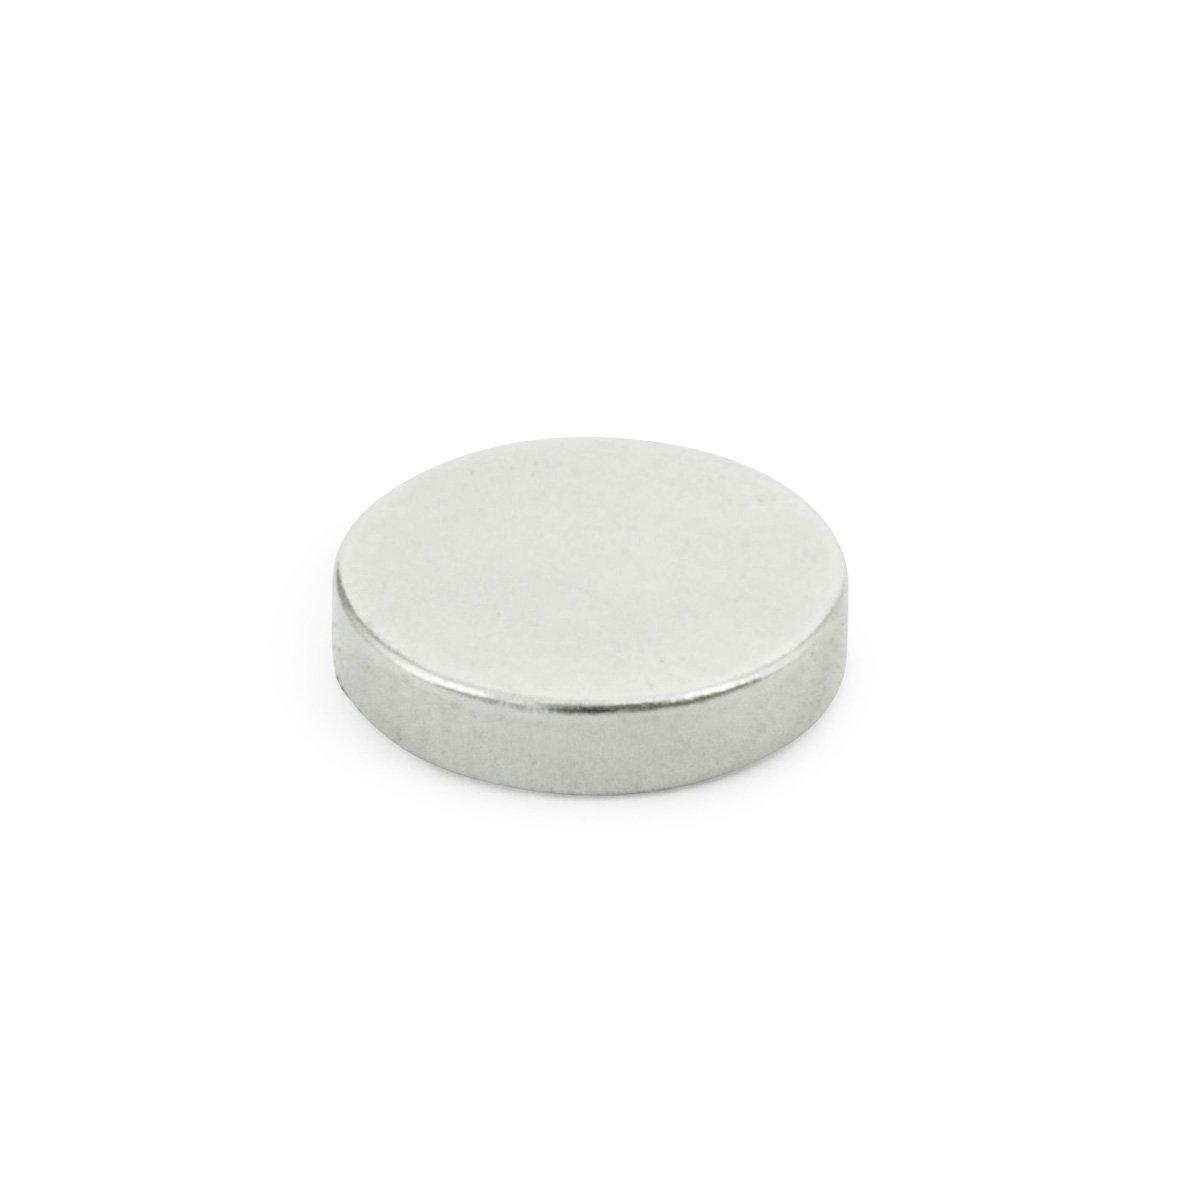 J.W. Winco 55.2-SC-12-3 GN55.2 Disk Shaped Raw Magnet, 0.47'' Diameter, 0.12'' Thickness, Samarium and Cobalt Combination AlNiCo Magnet